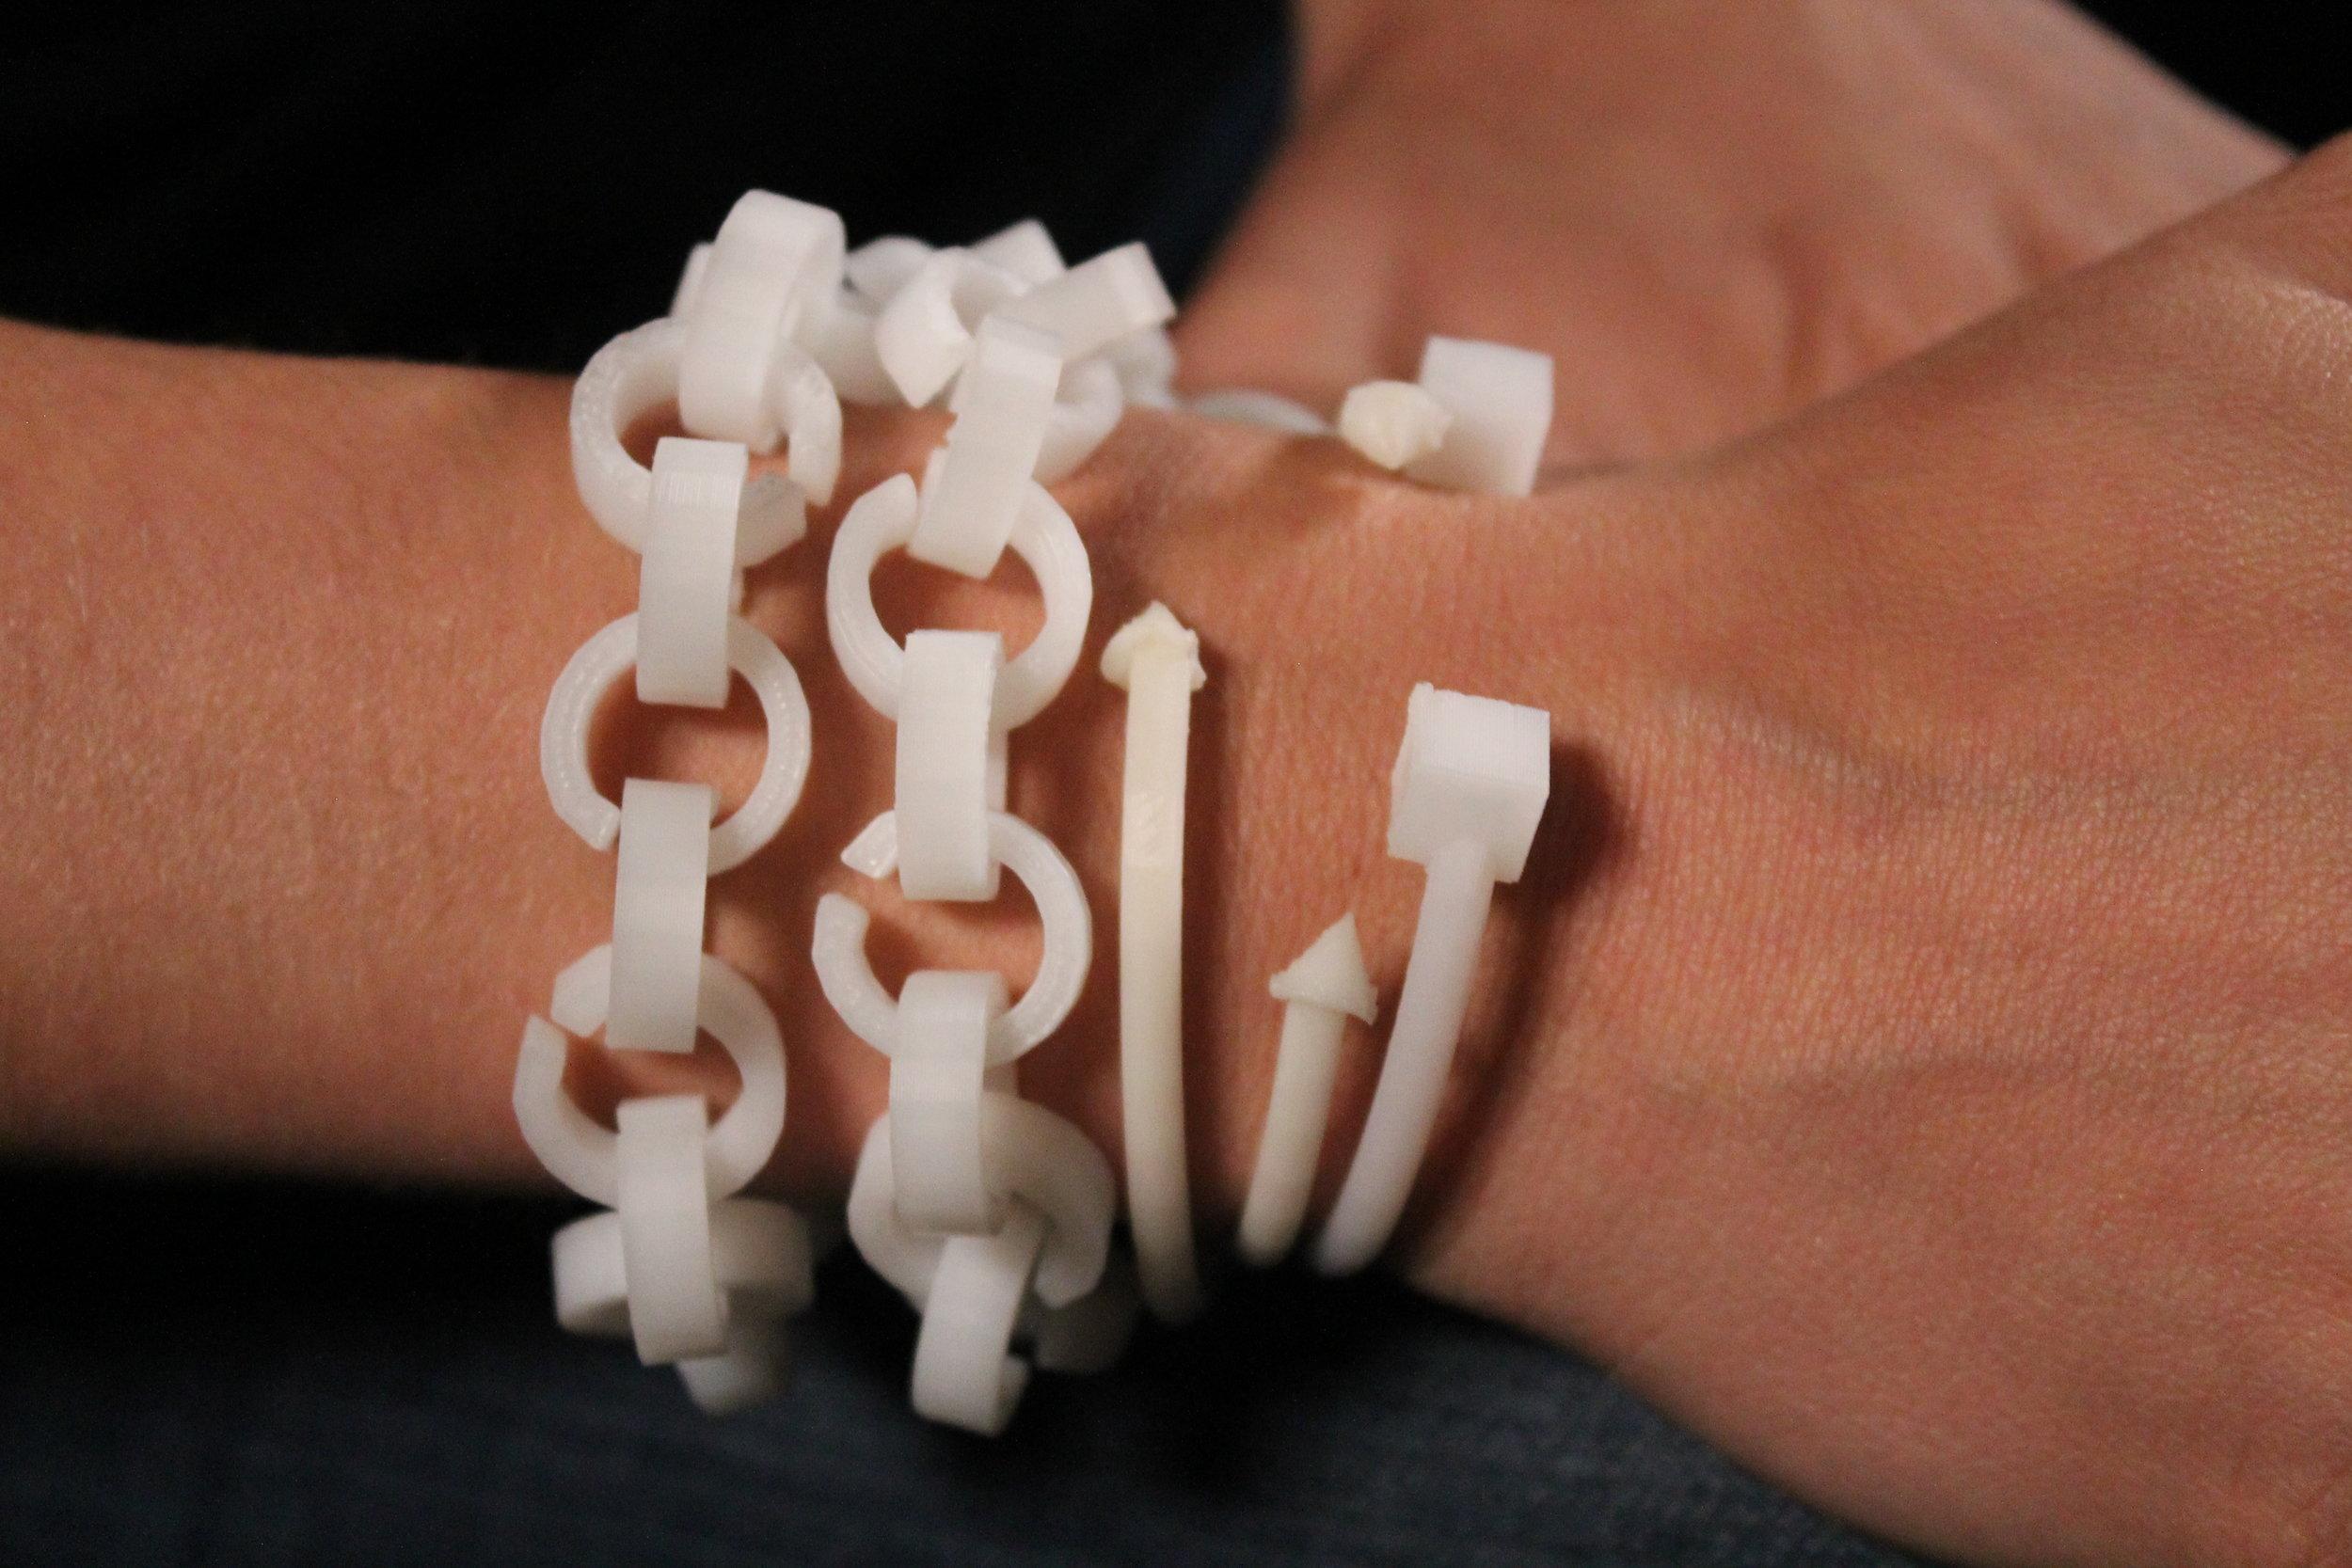 chain-link-bracelet-arrow-cuffs-box-cuff-left-to-right_34987742721_o.jpg